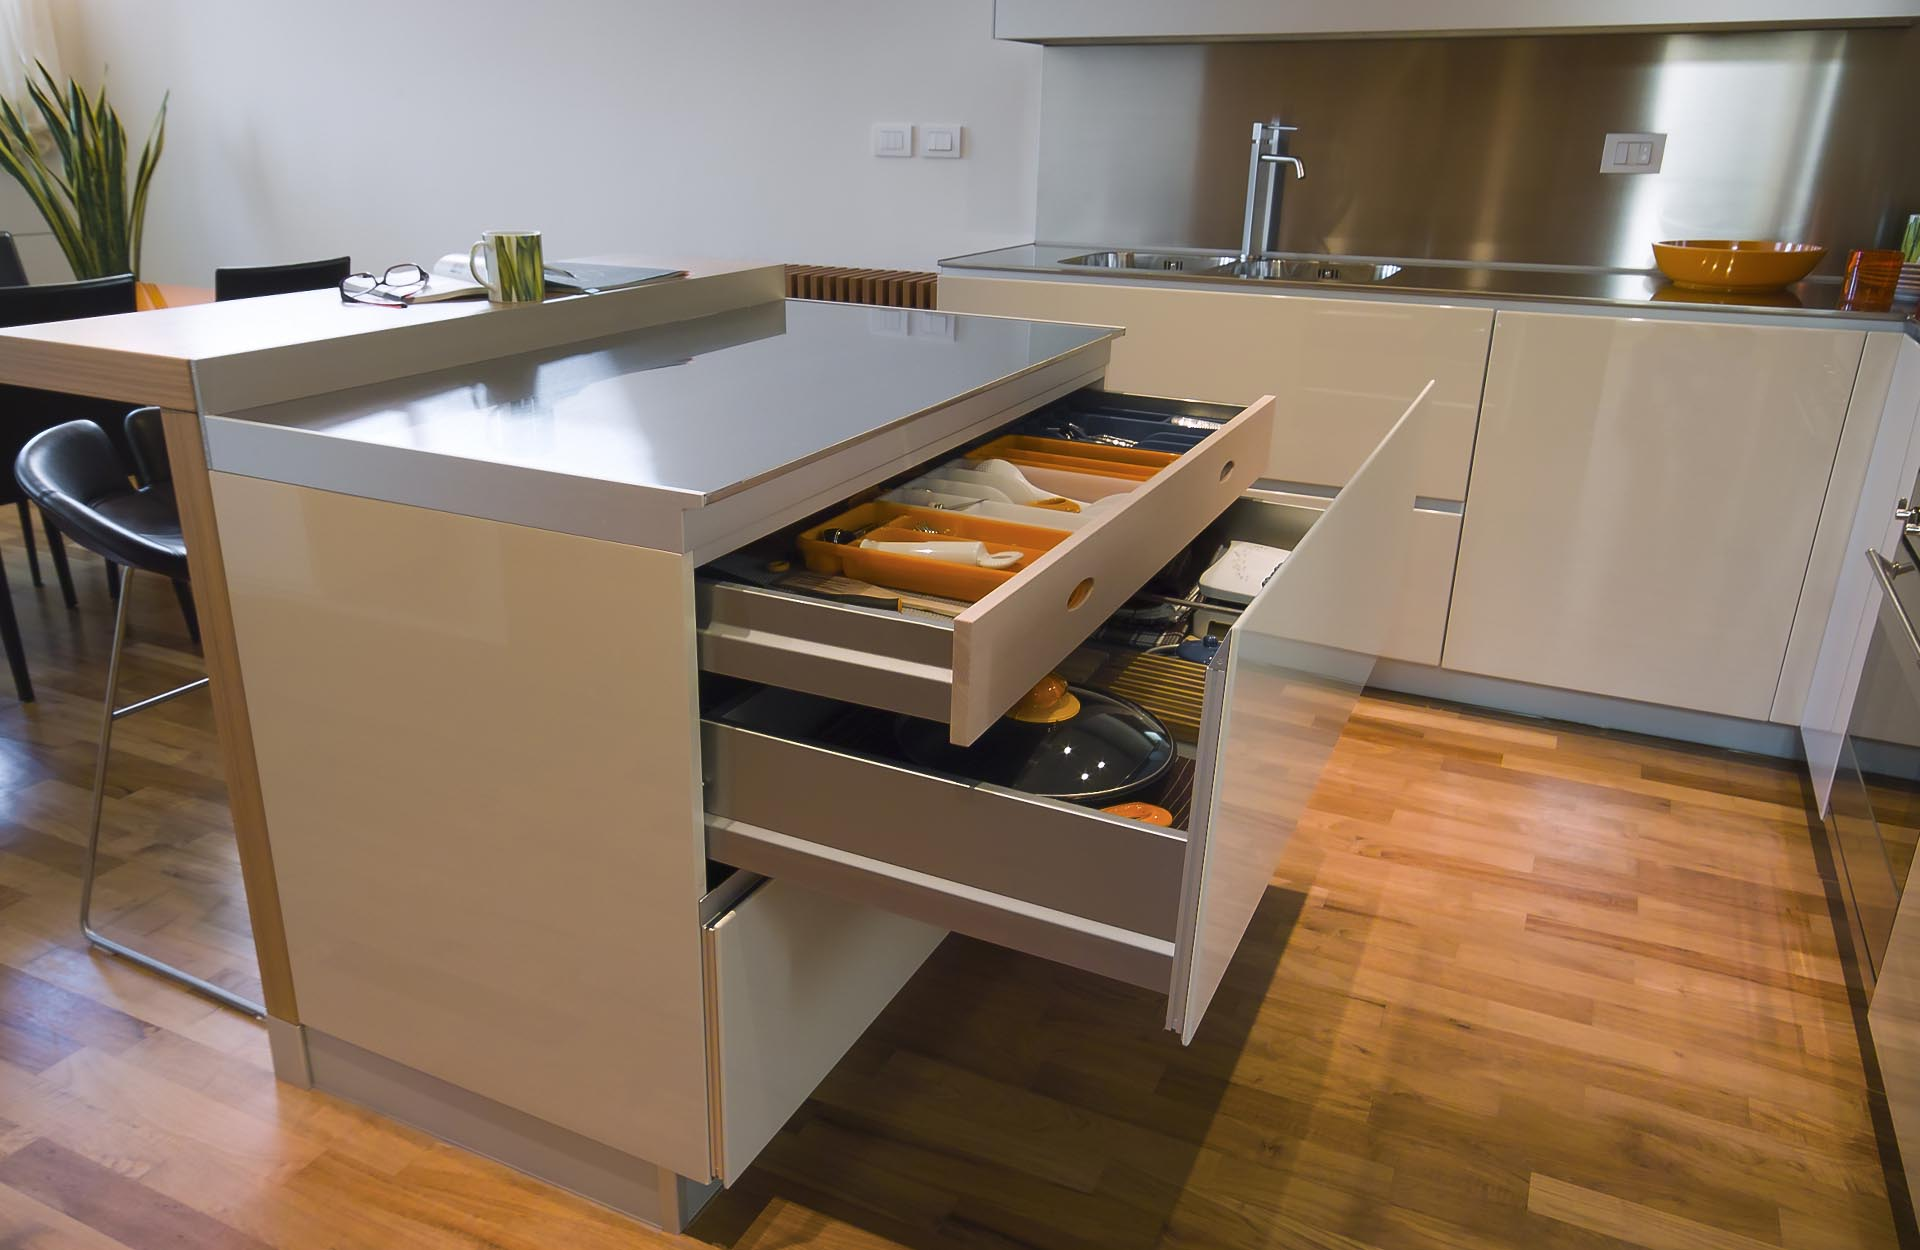 spazi in cucina